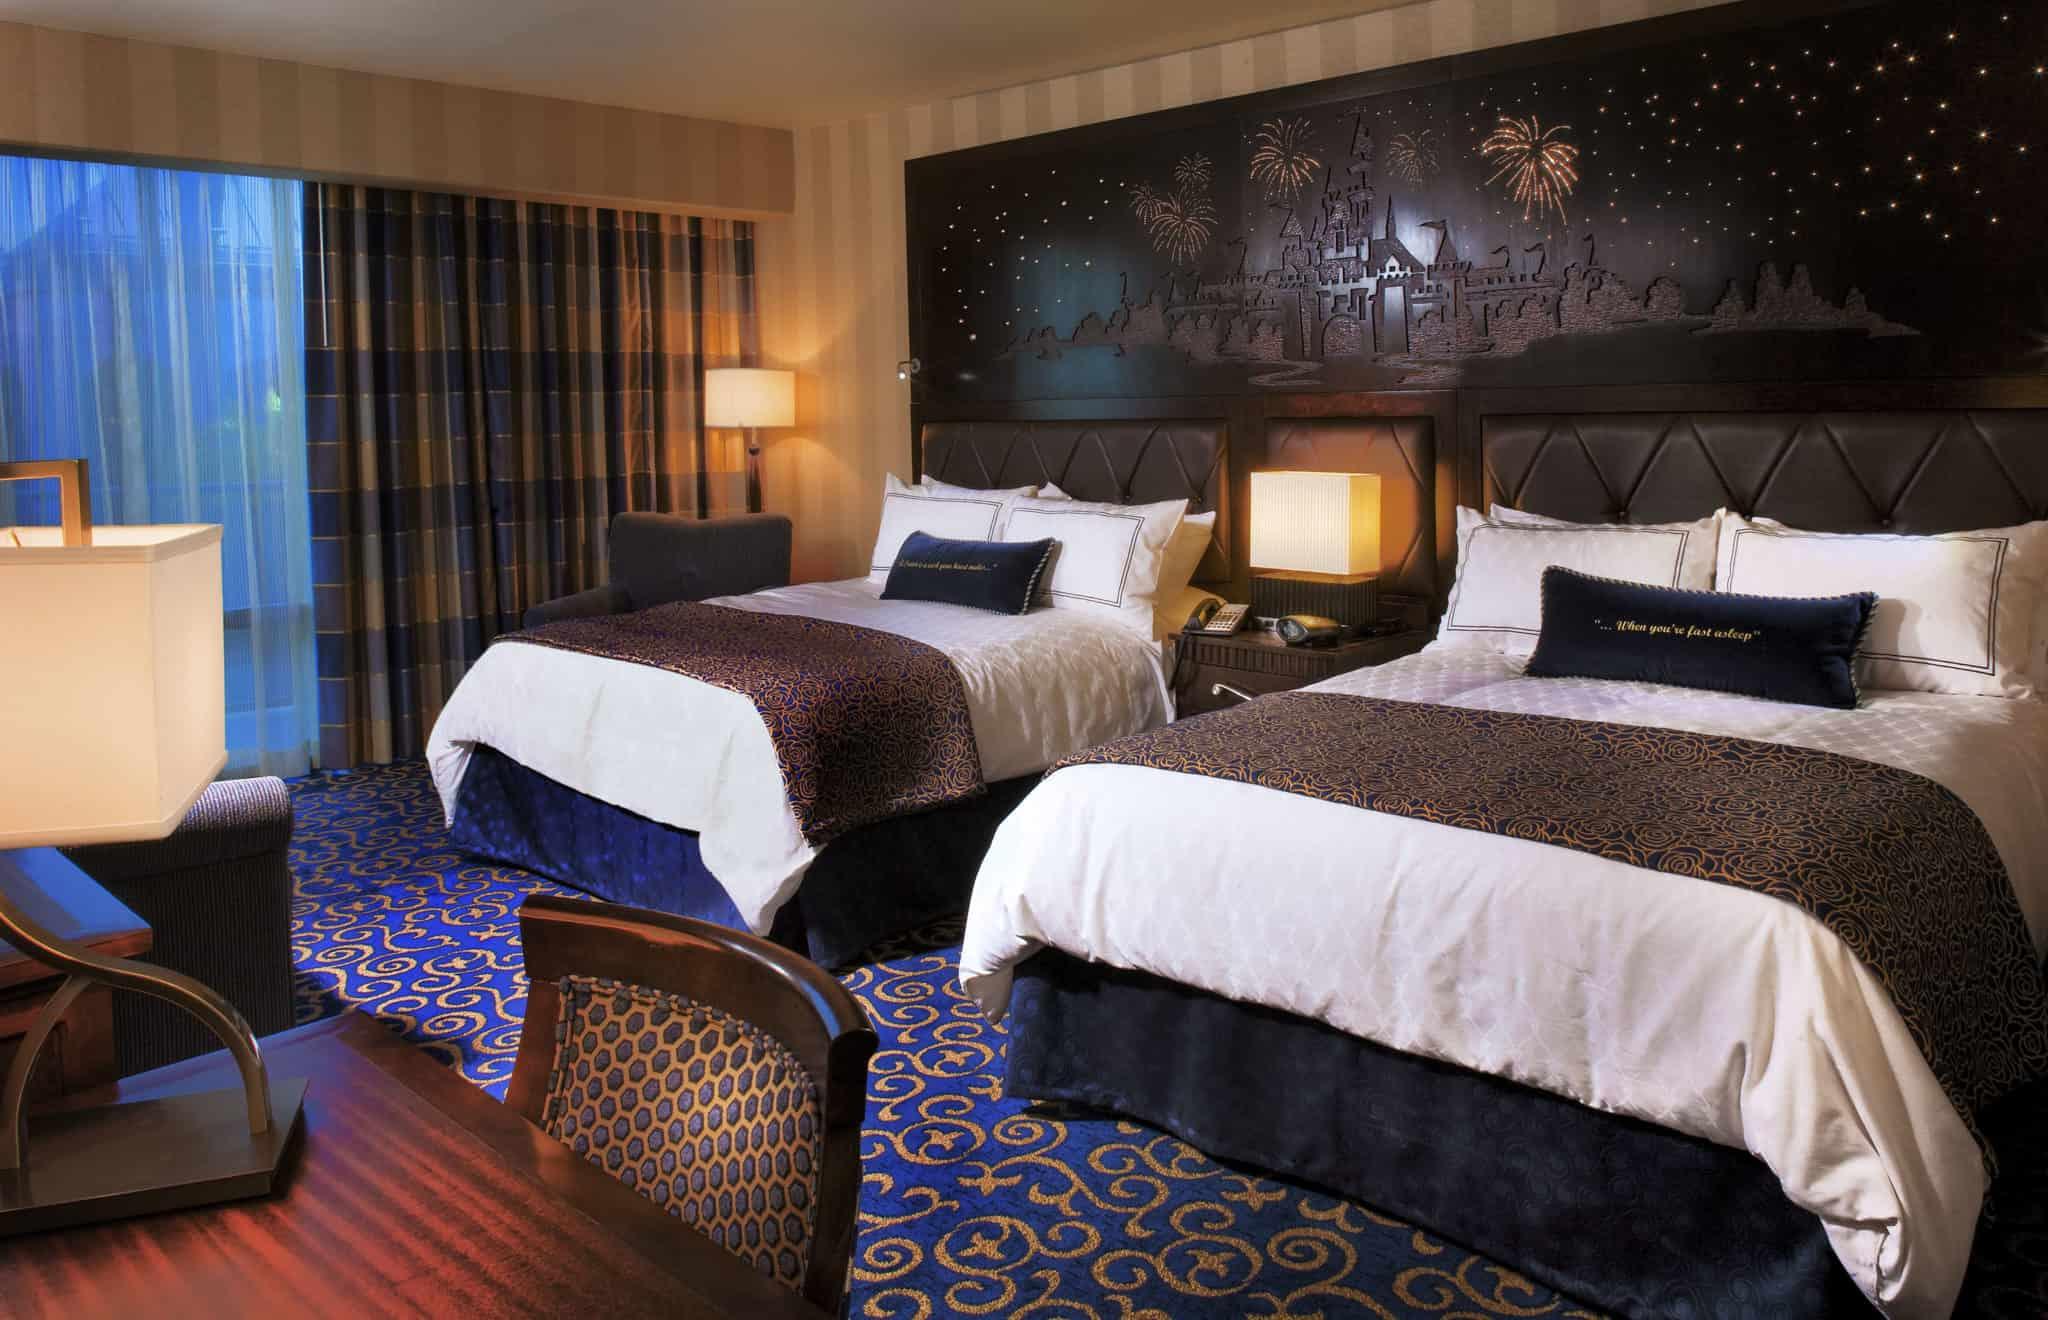 Disneyland Hotel deal